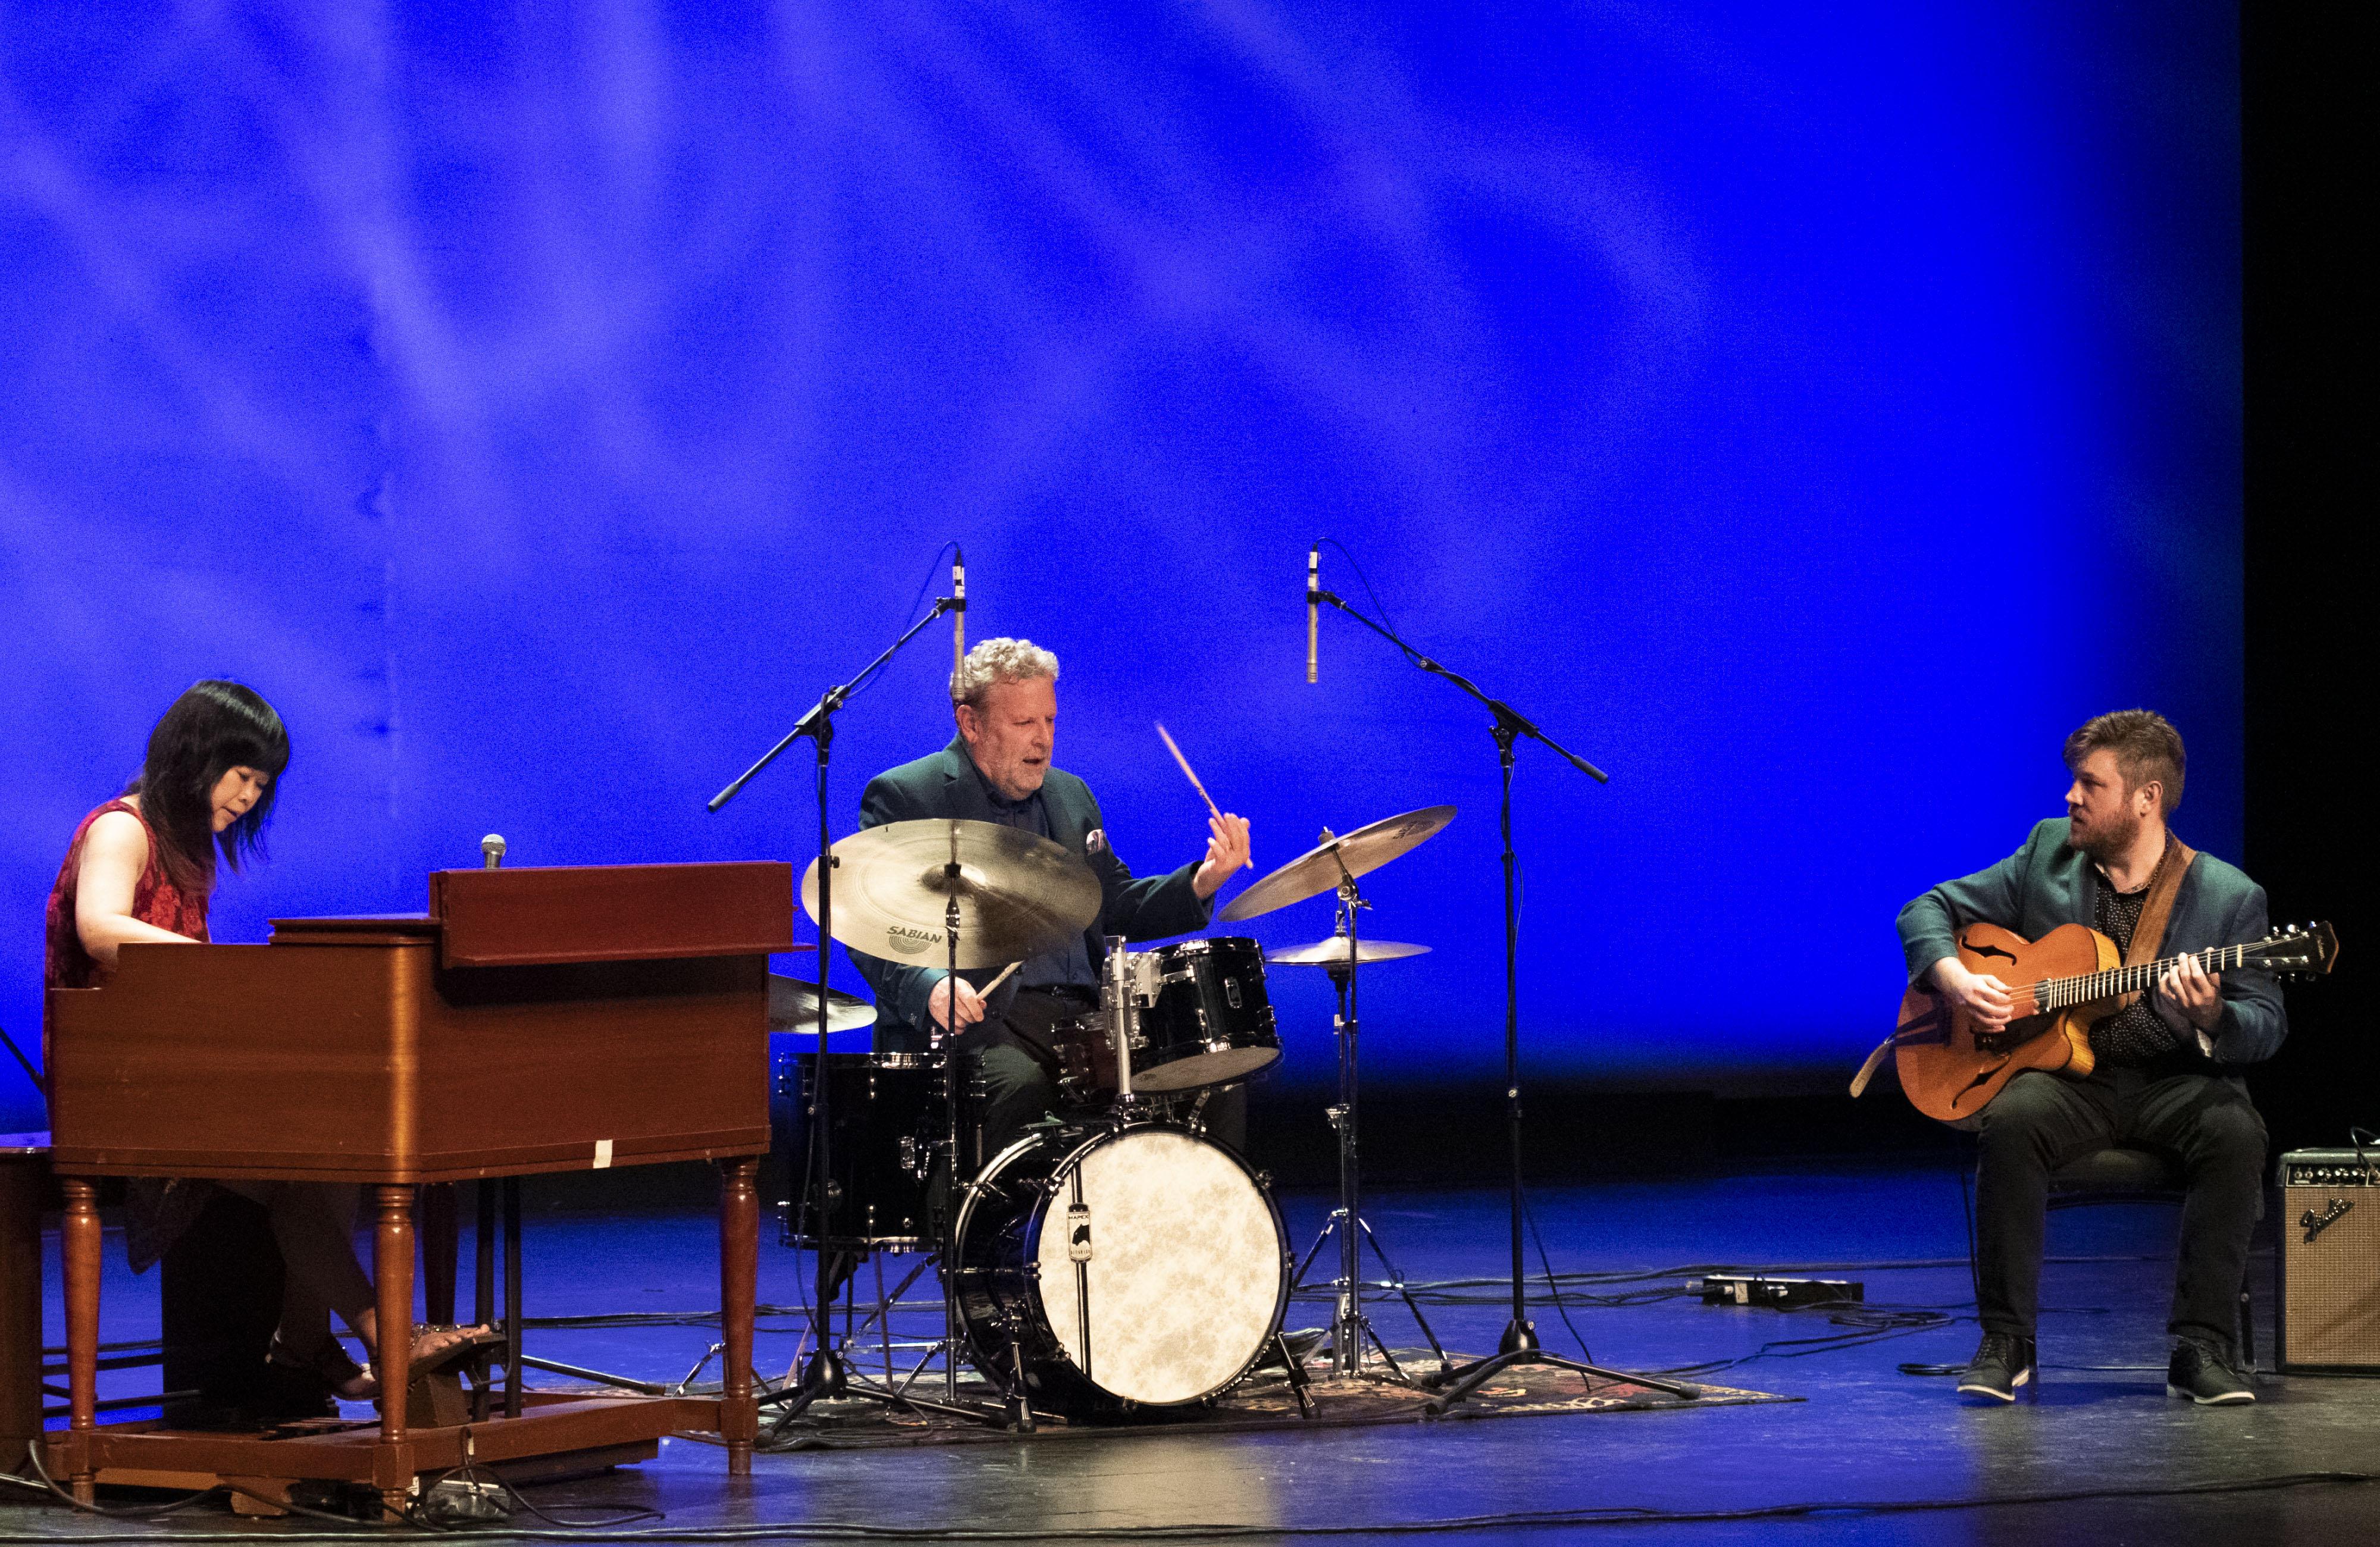 Akiko Tsuruga, Jeff Hamilton, and Graham Dechter